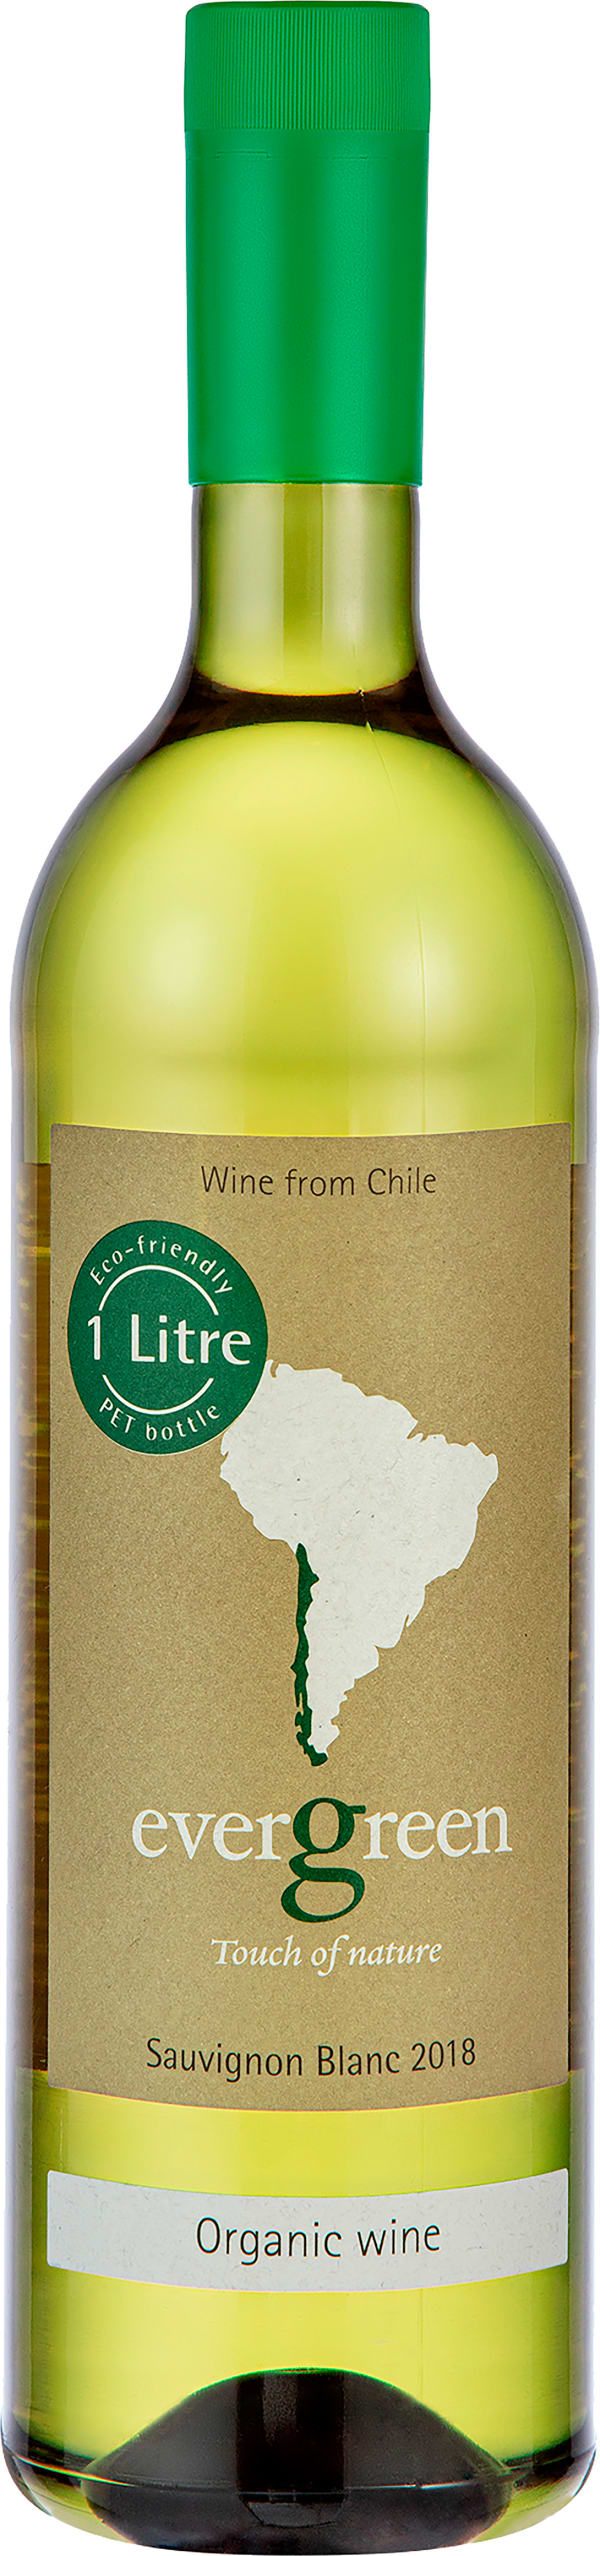 Evergreen Sauvignon Blanc 2016 plastflaska